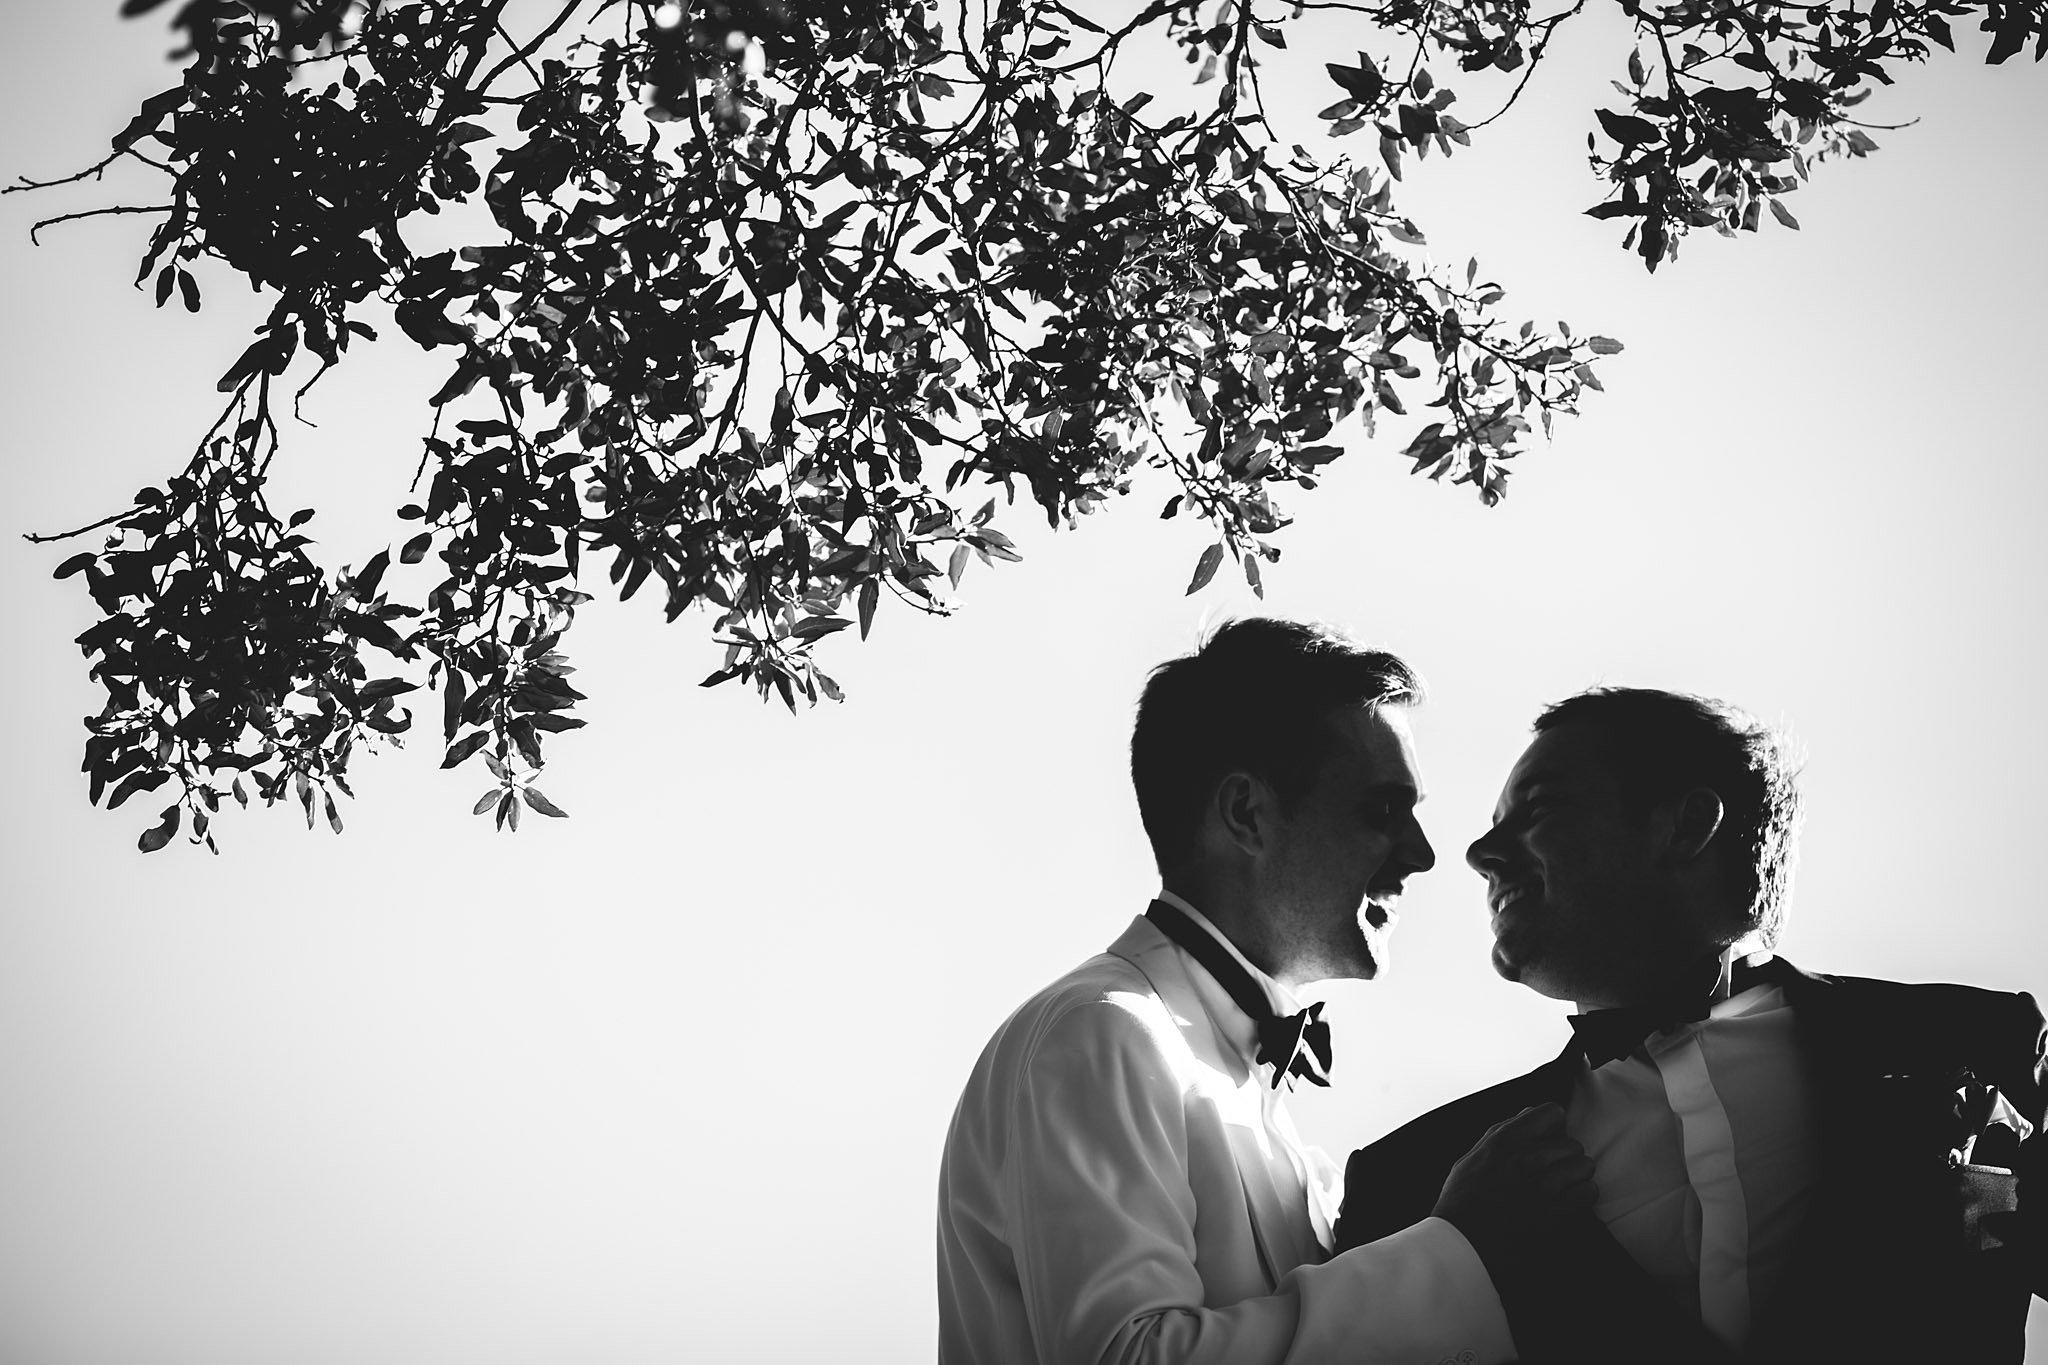 loric gonzalez photographe mariage perpignan photographe perpignan - Photographe Mariage Perpignan